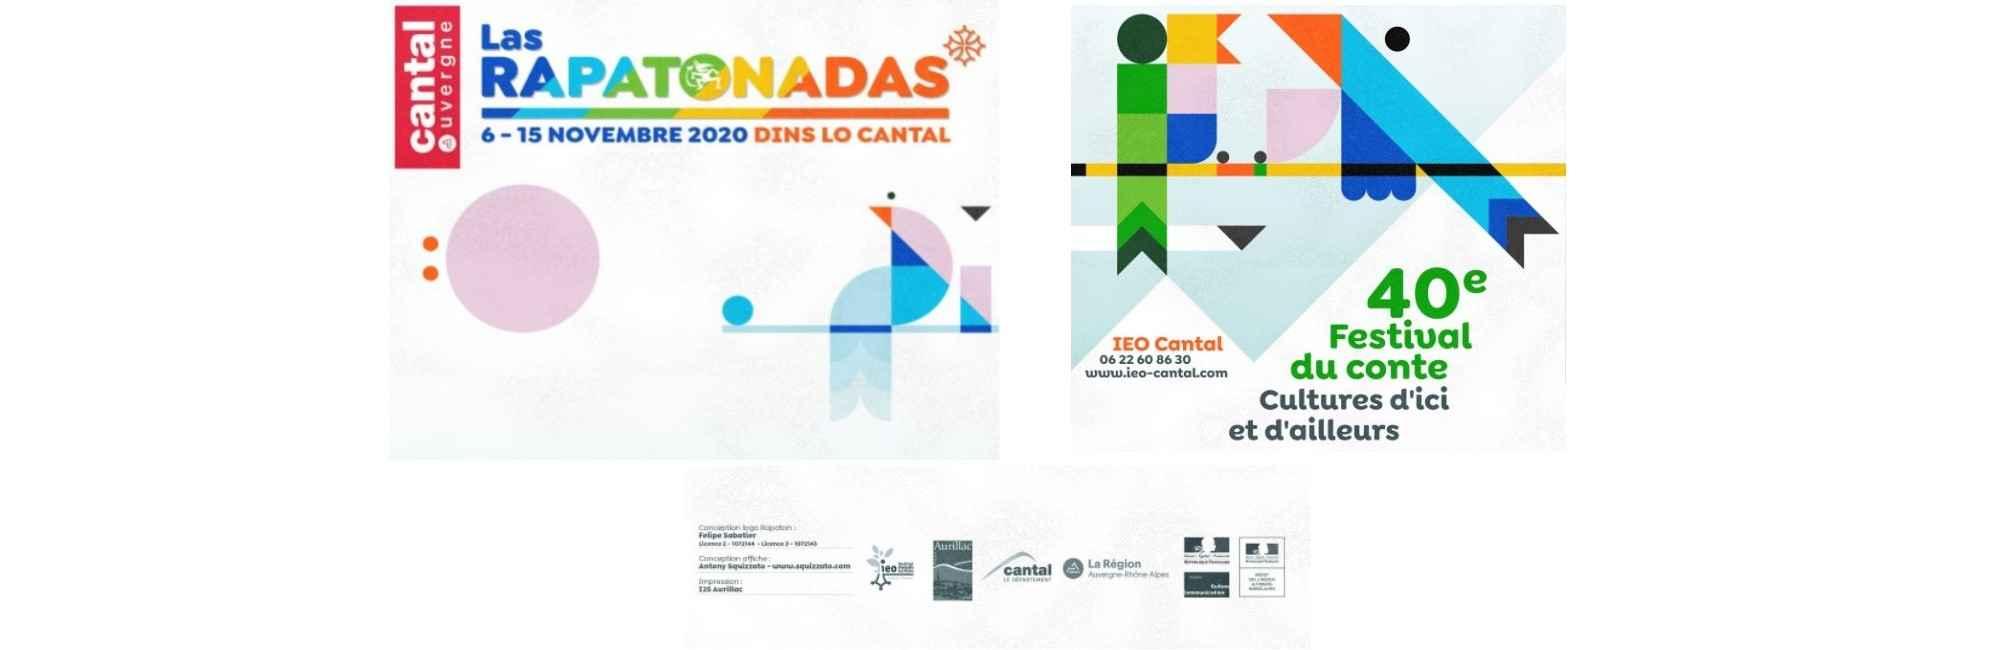 Affiche-Festival-Las-Rapatonadas-2020 horizontale